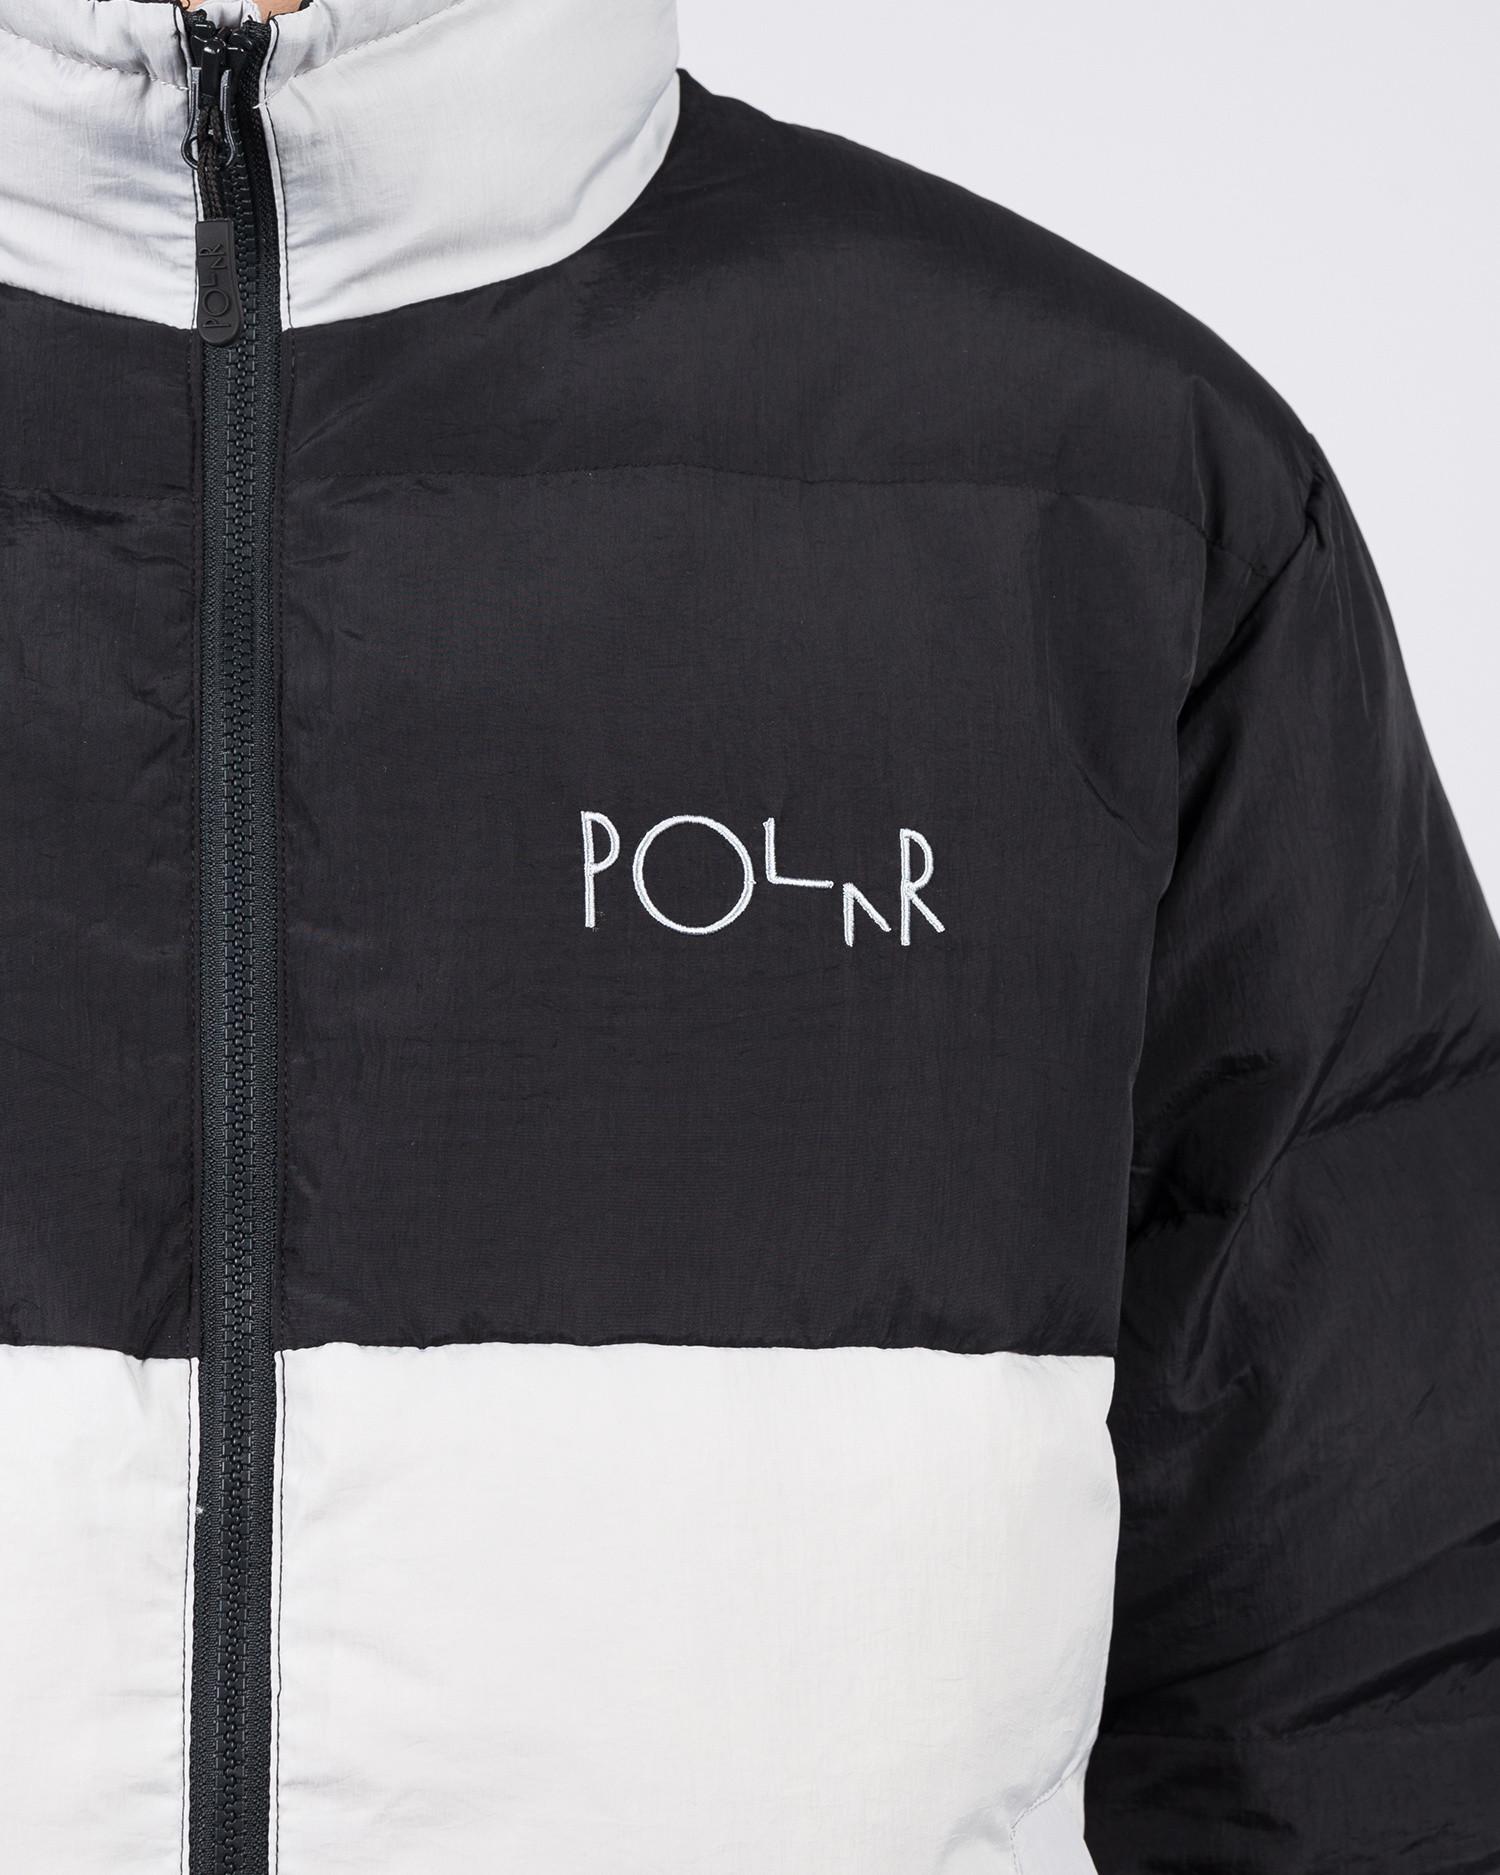 Polar Combo Puffer Black/Ice Grey